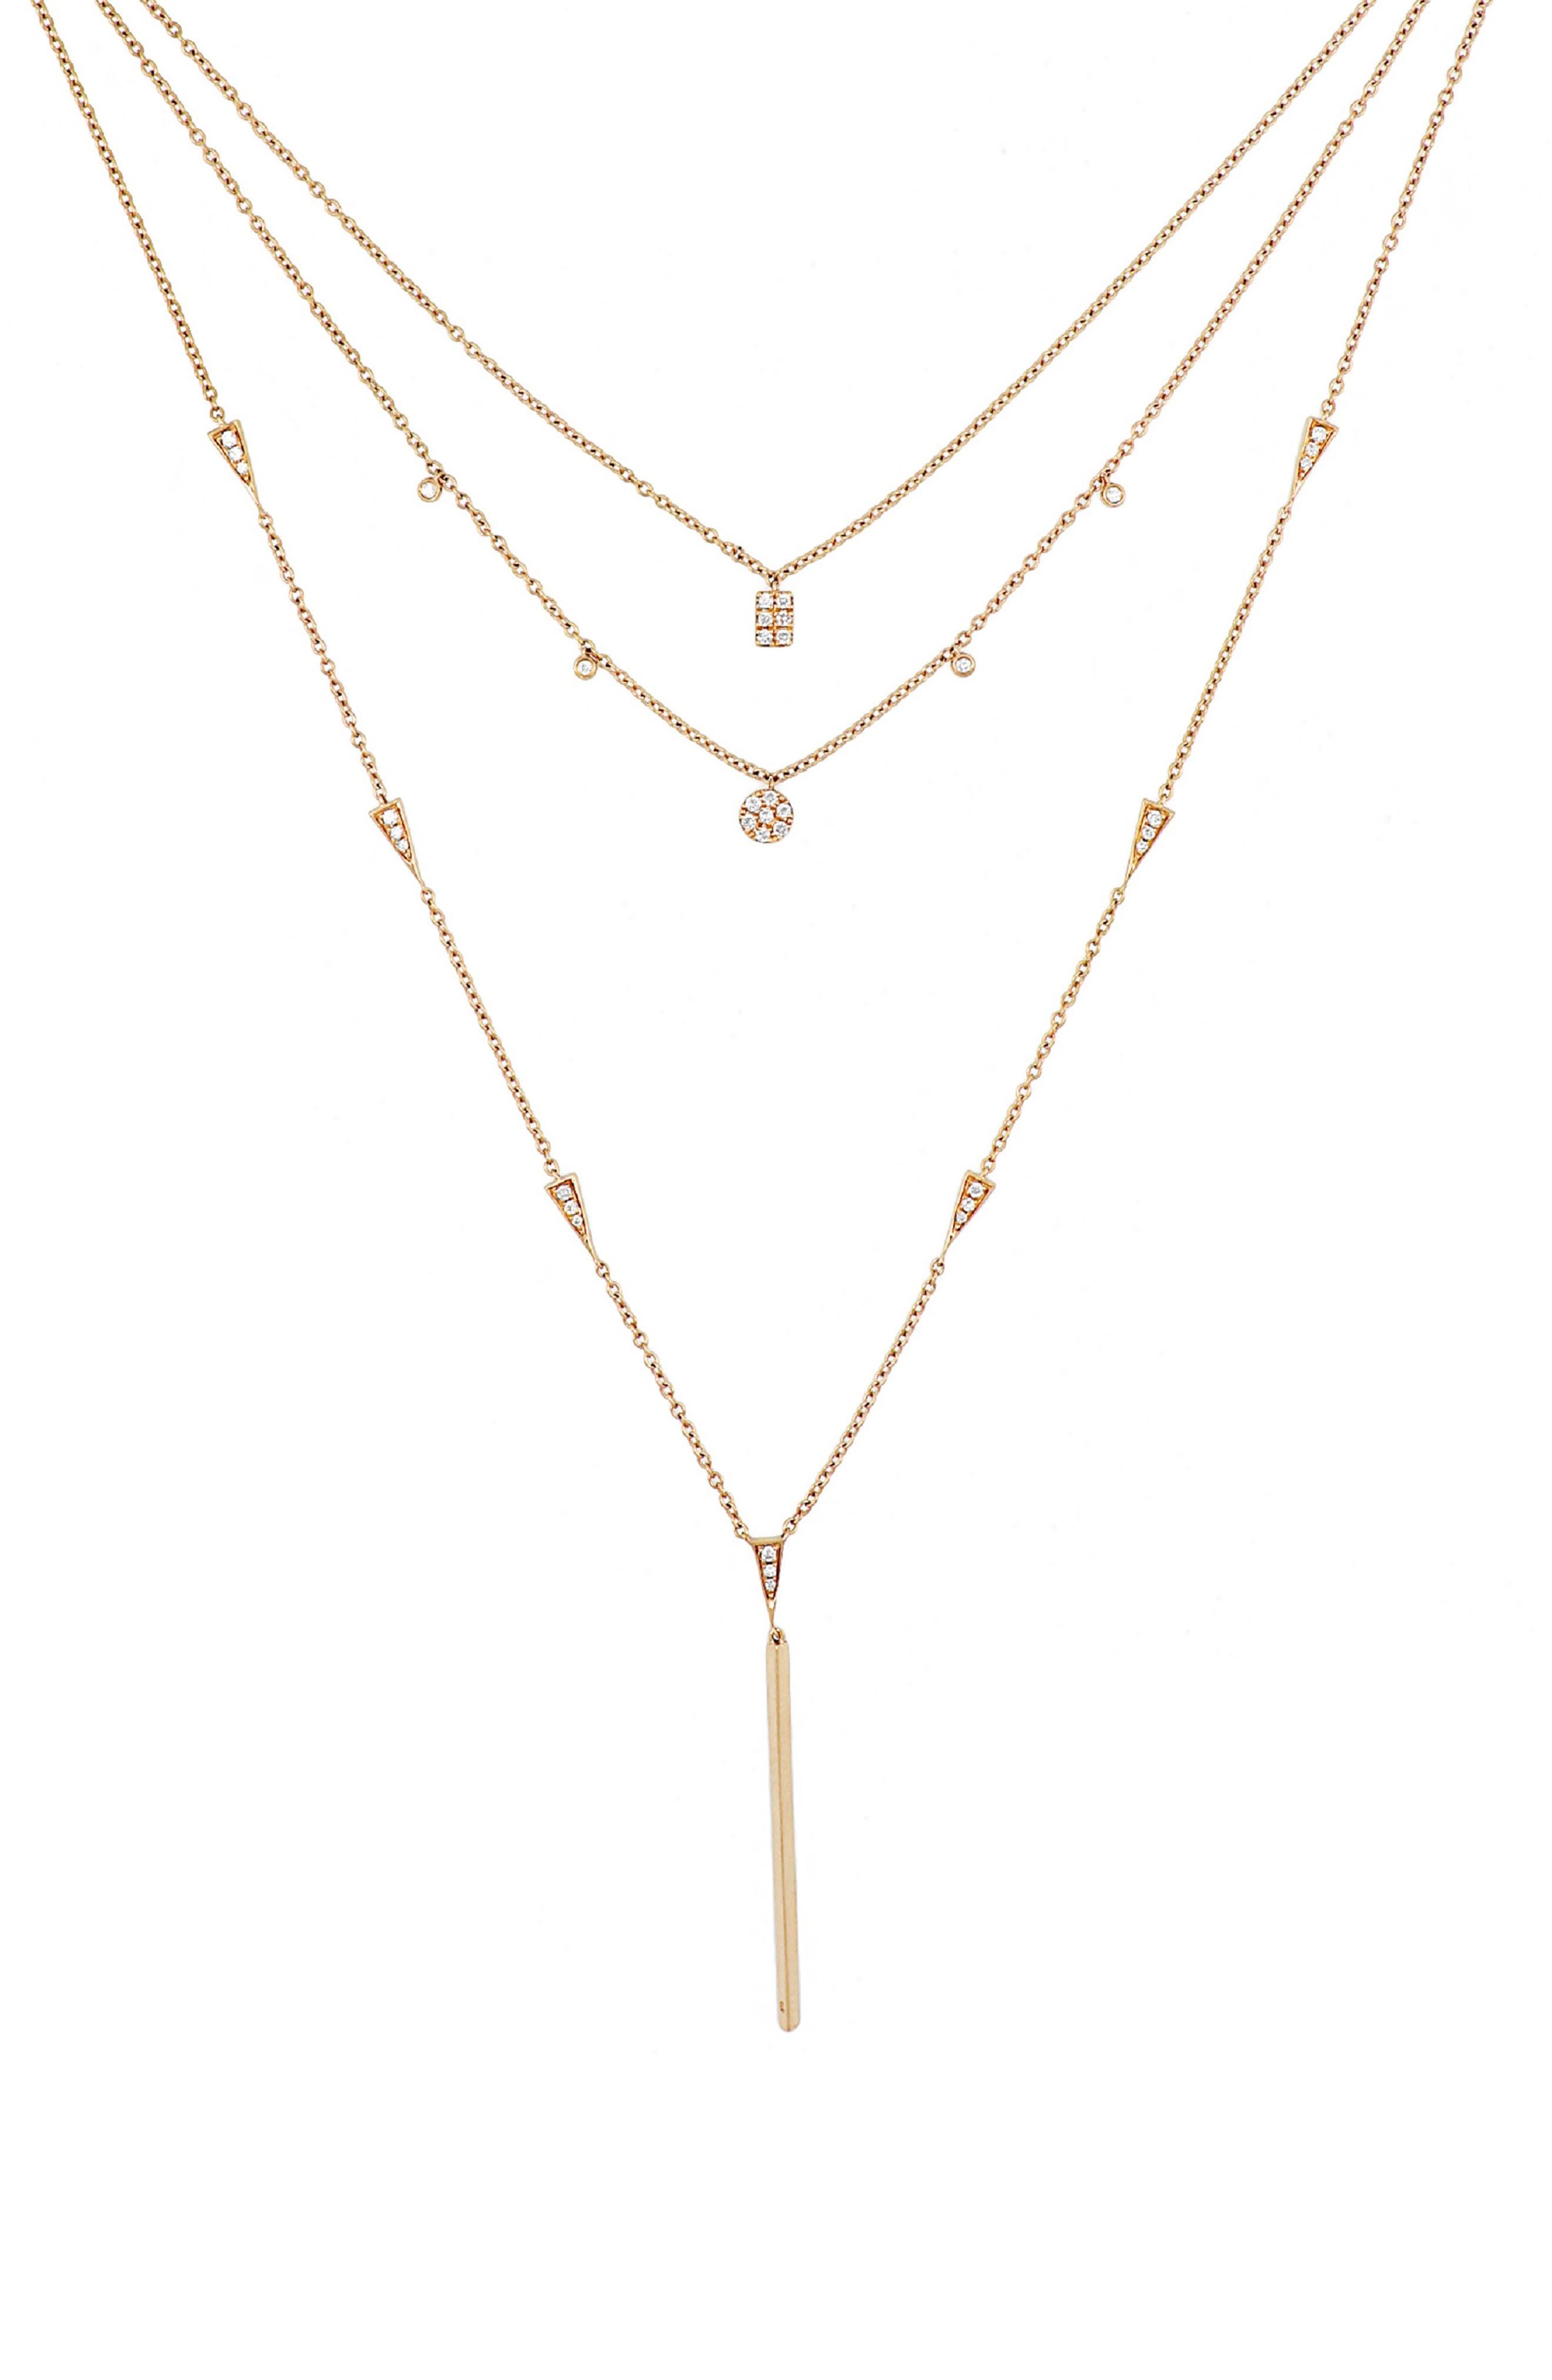 Diamond Layered Necklace,                             Main thumbnail 1, color,                             ROSE GOLD/ DIAMOND